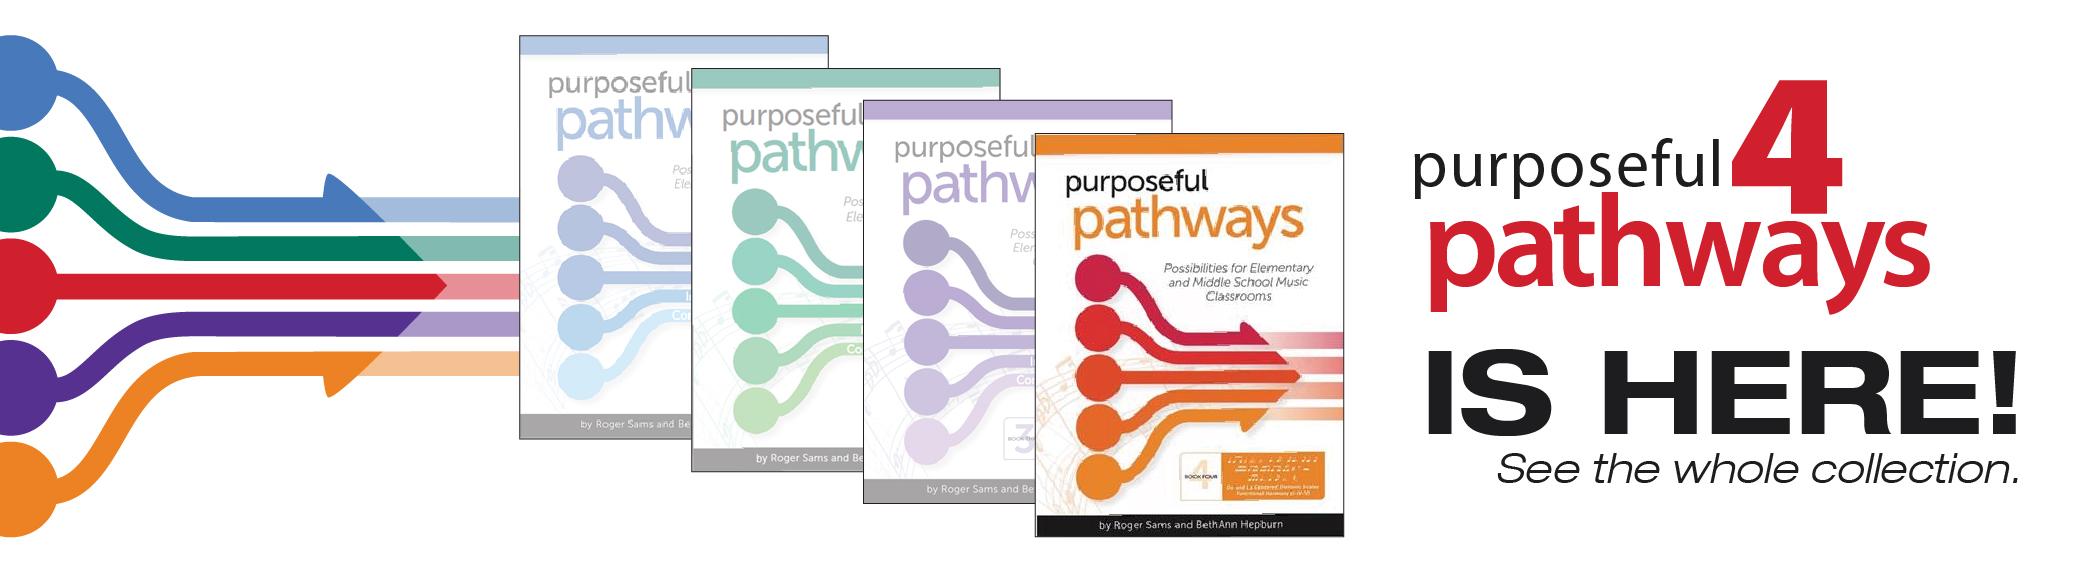 Purposeful Pathways